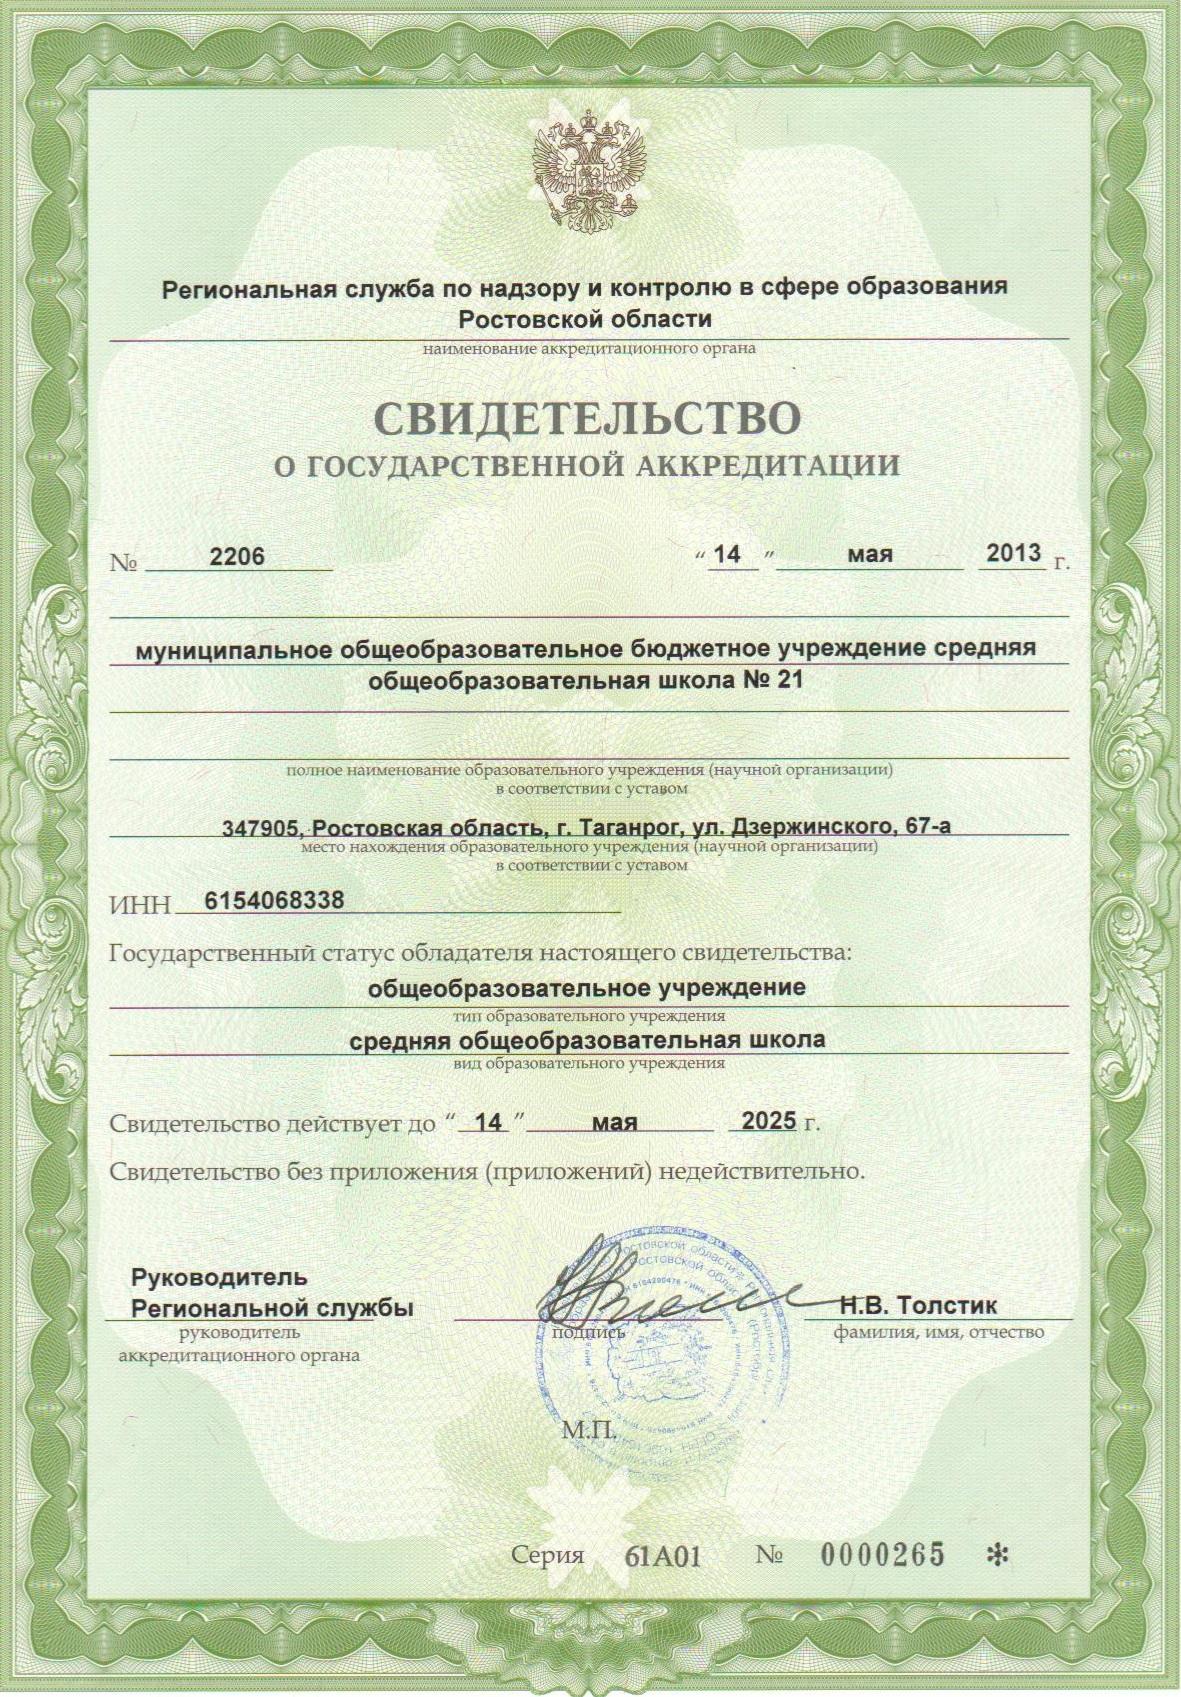 св-во об аккредитации